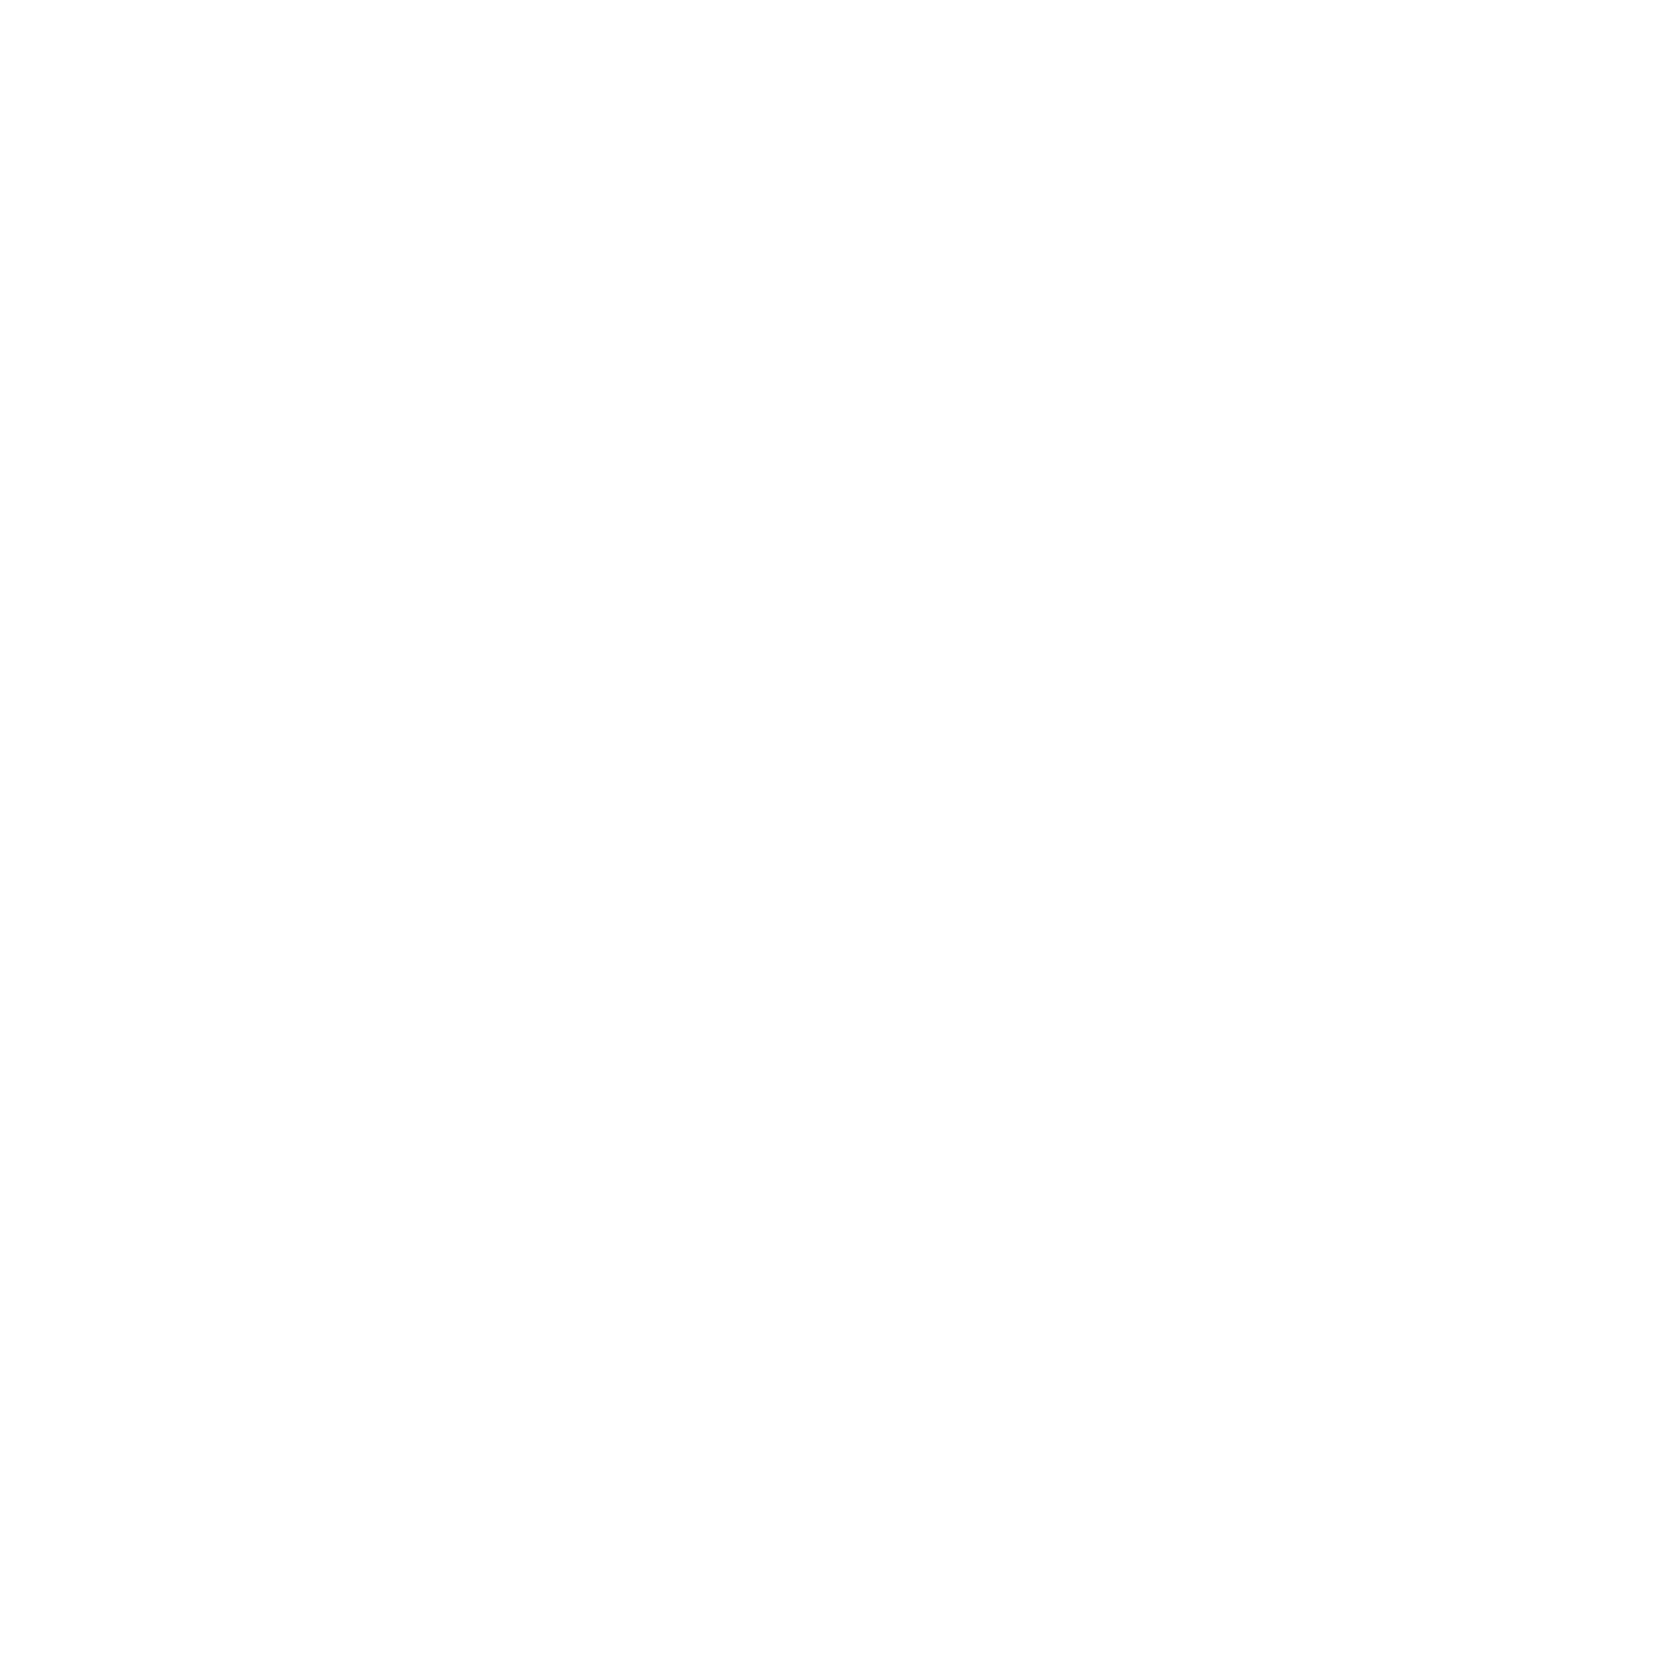 Shipedge Warehouse Management System